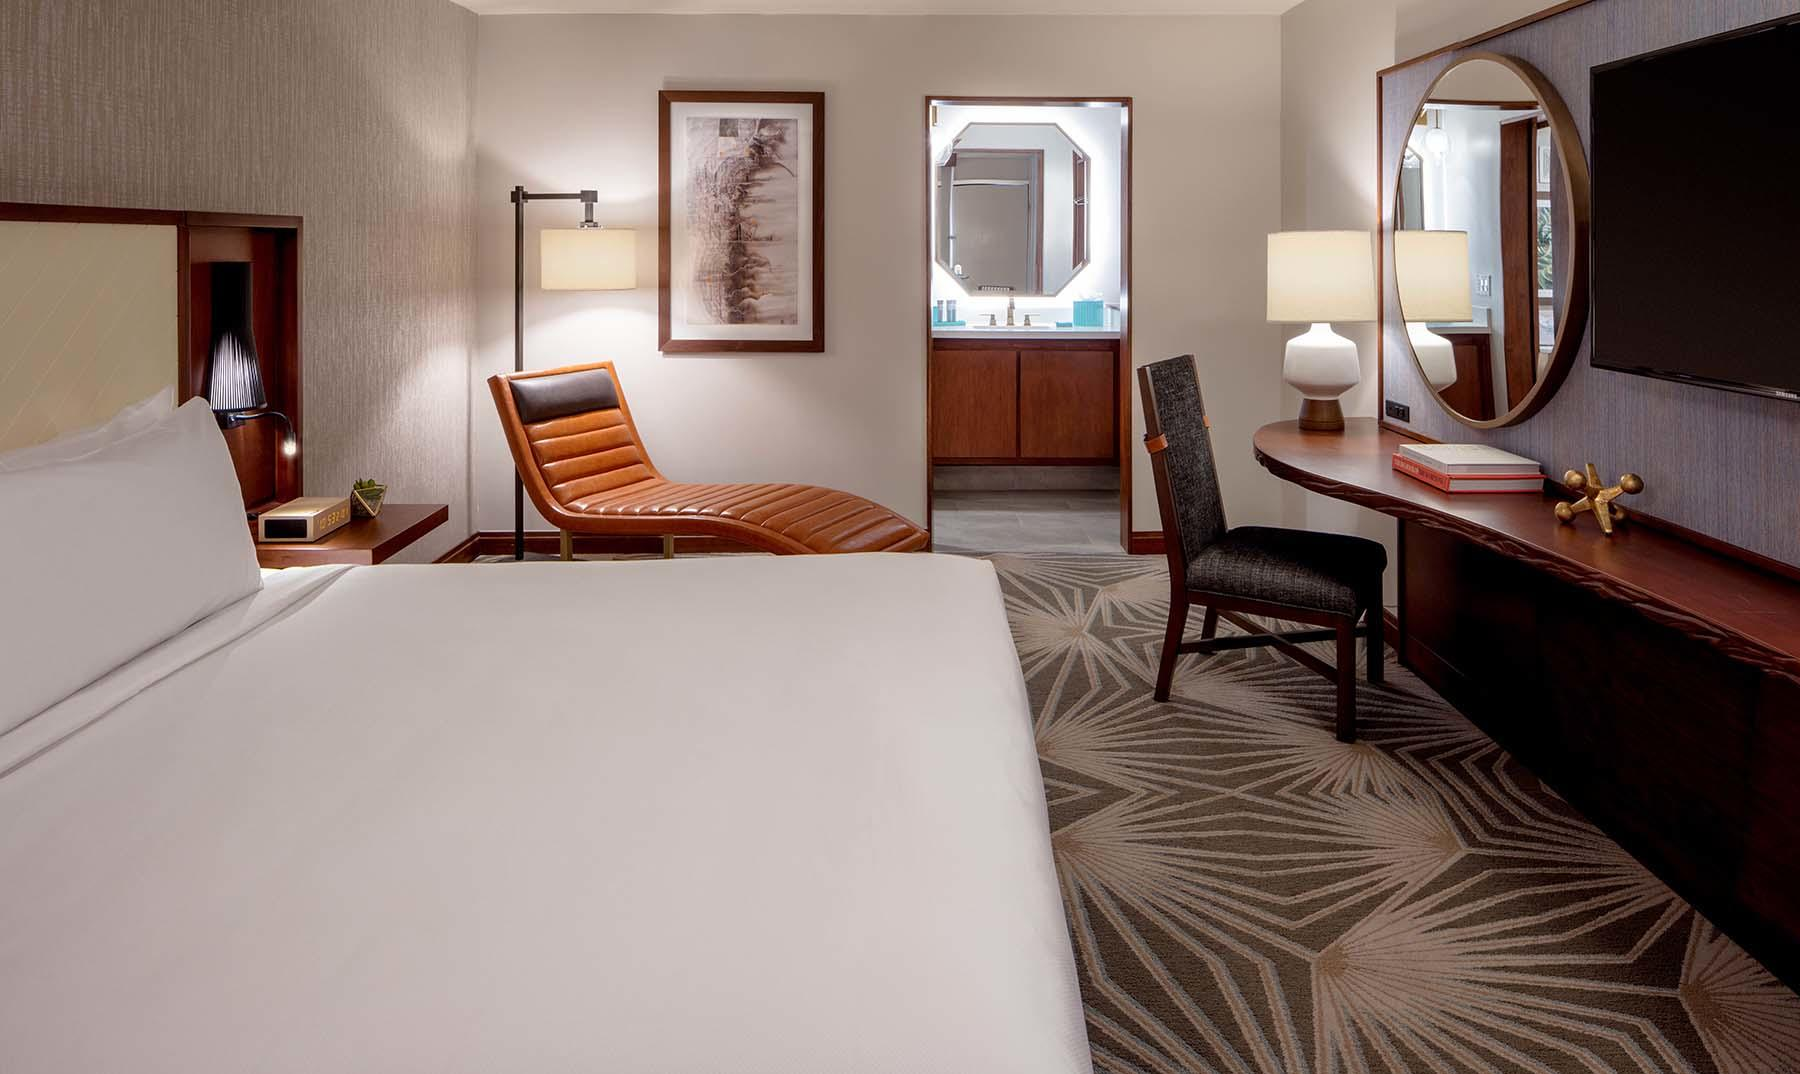 Hotel Adeline image 21